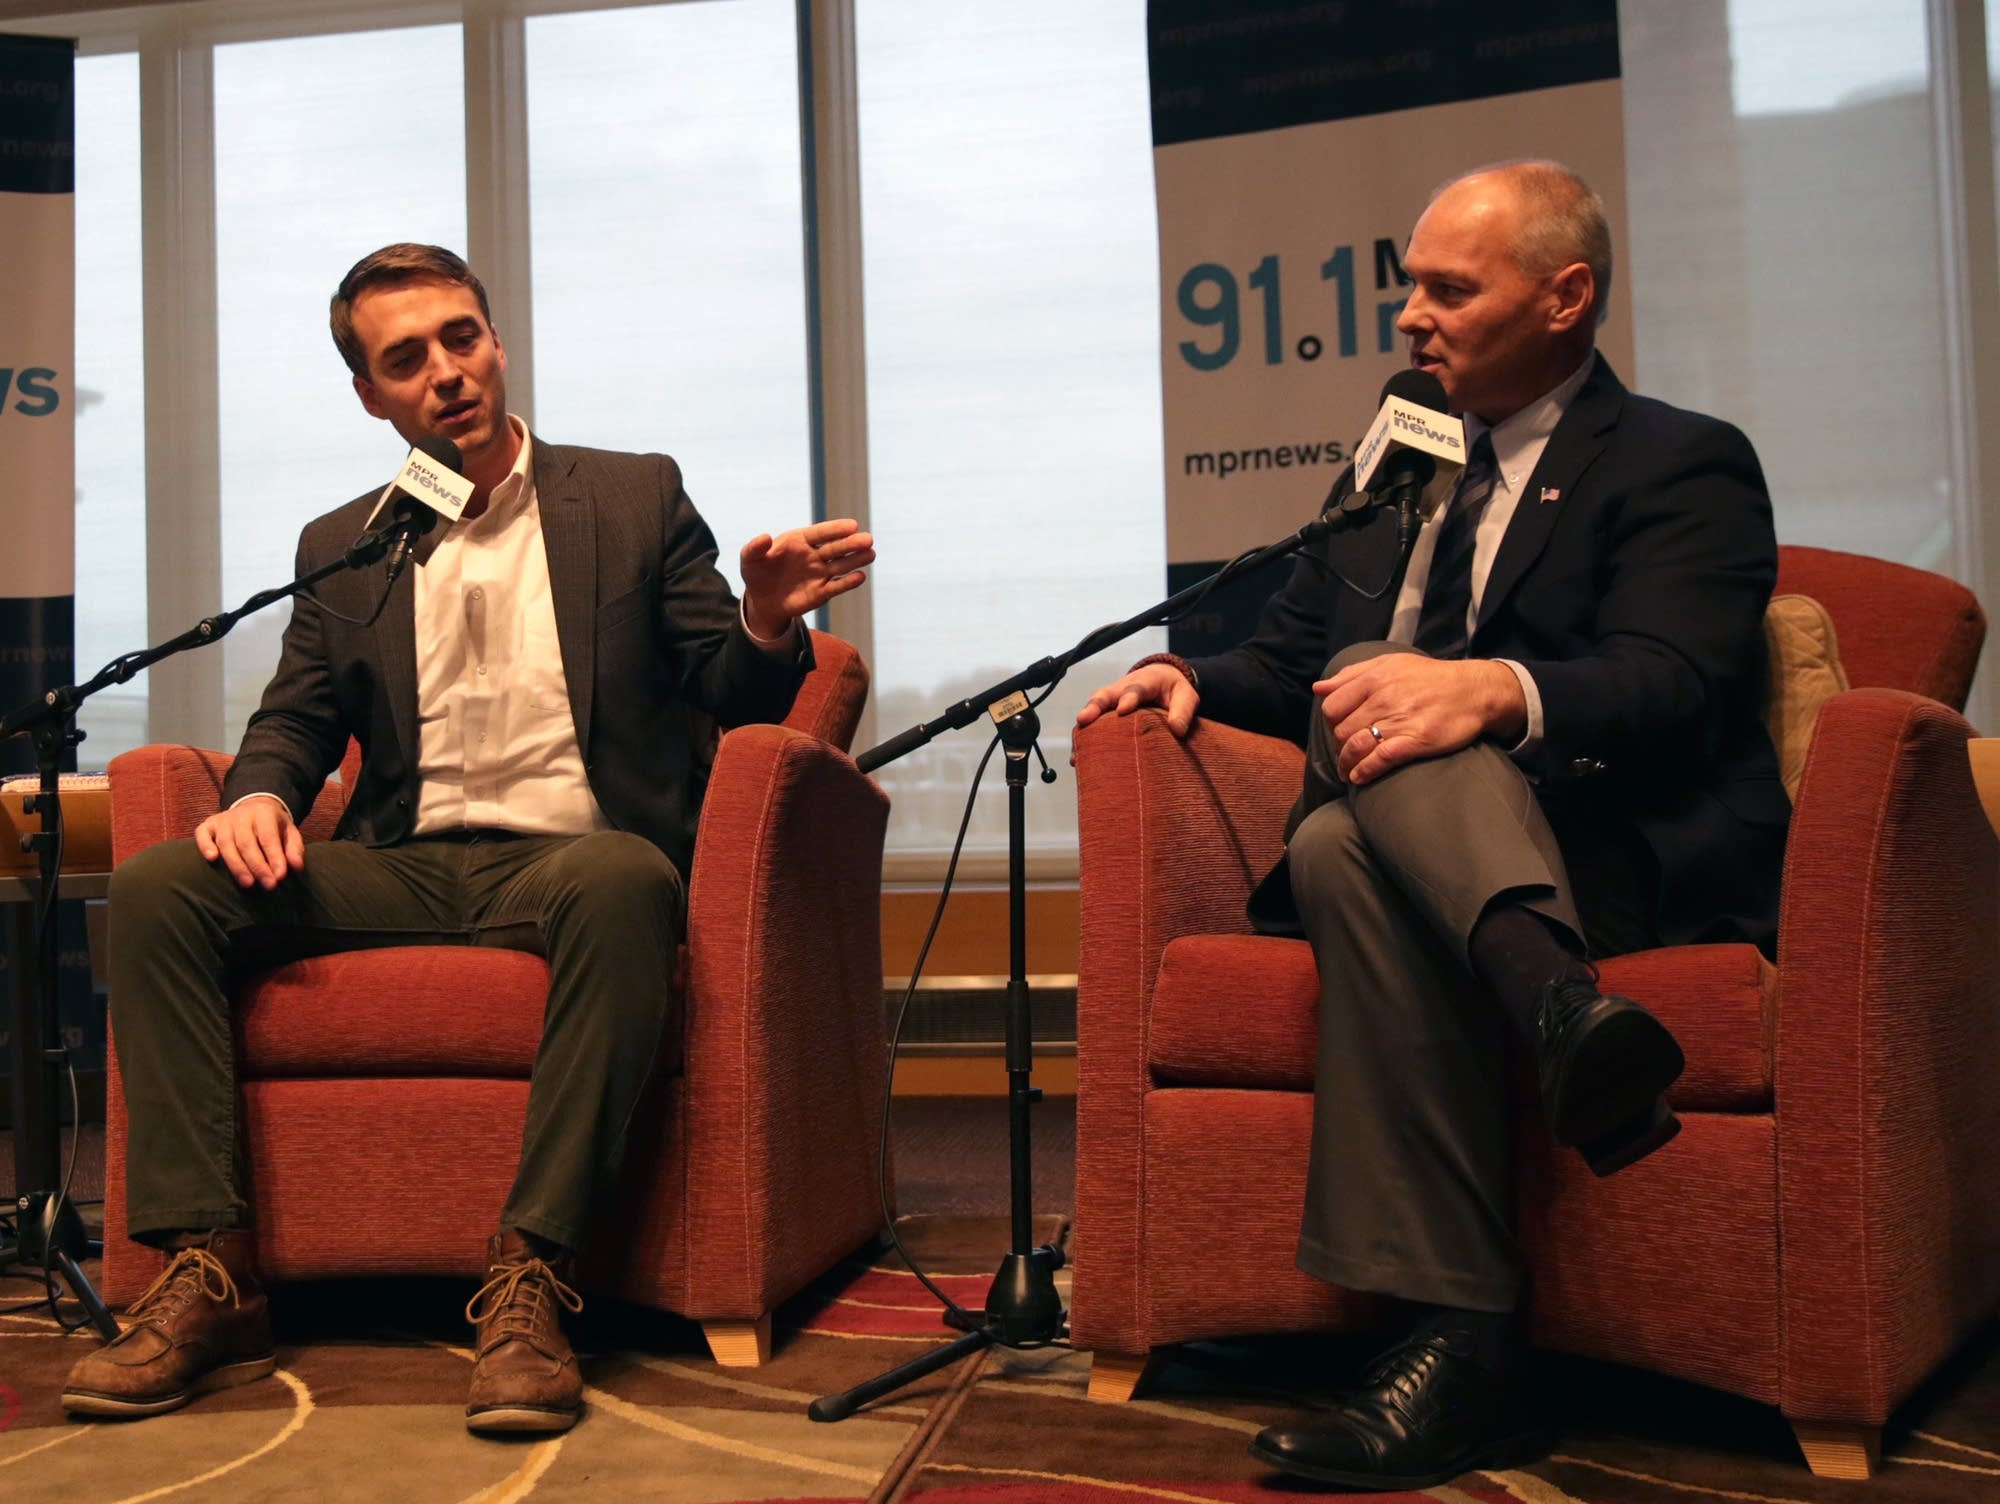 Democrat Joe Radinovich and Republican Pete Stauber debate on MPR News.